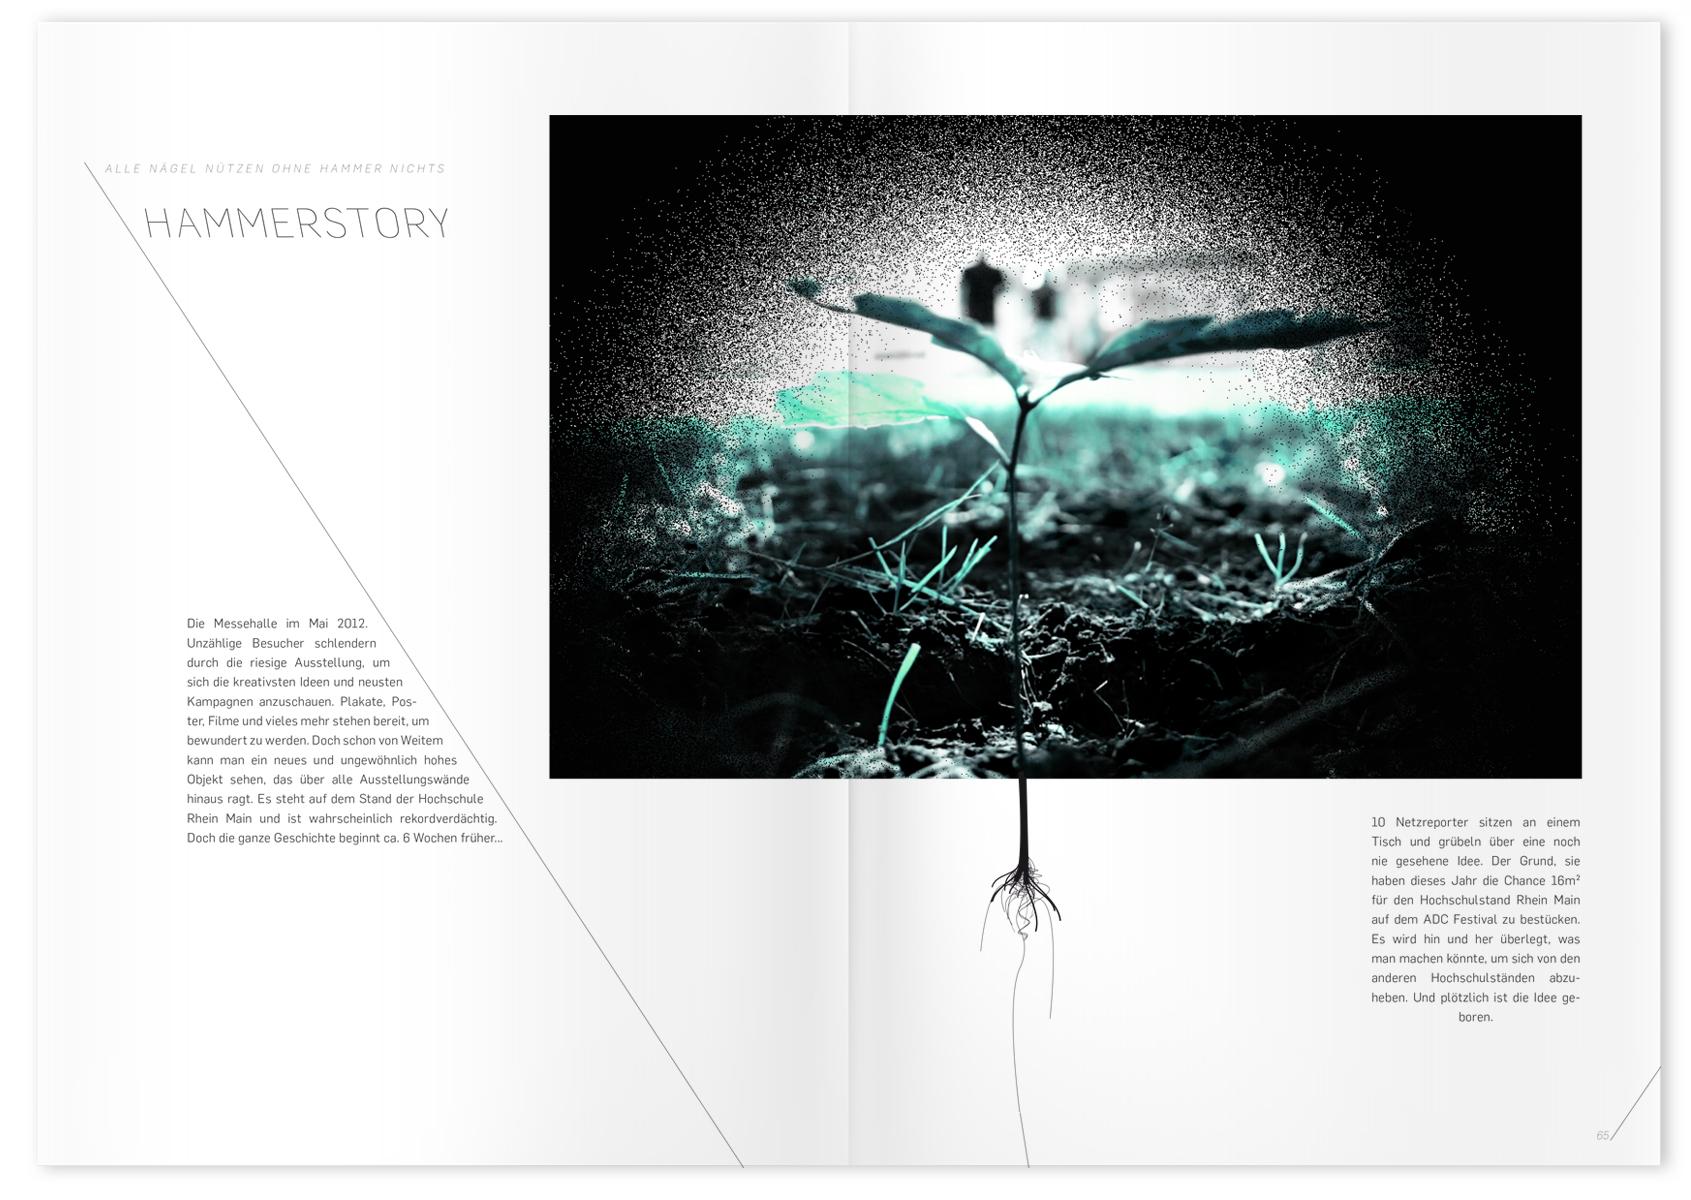 02_hFMA Netzreporter_ADC Festival_Editorial Design_Grafikdesign_Gloria Kison.jpg